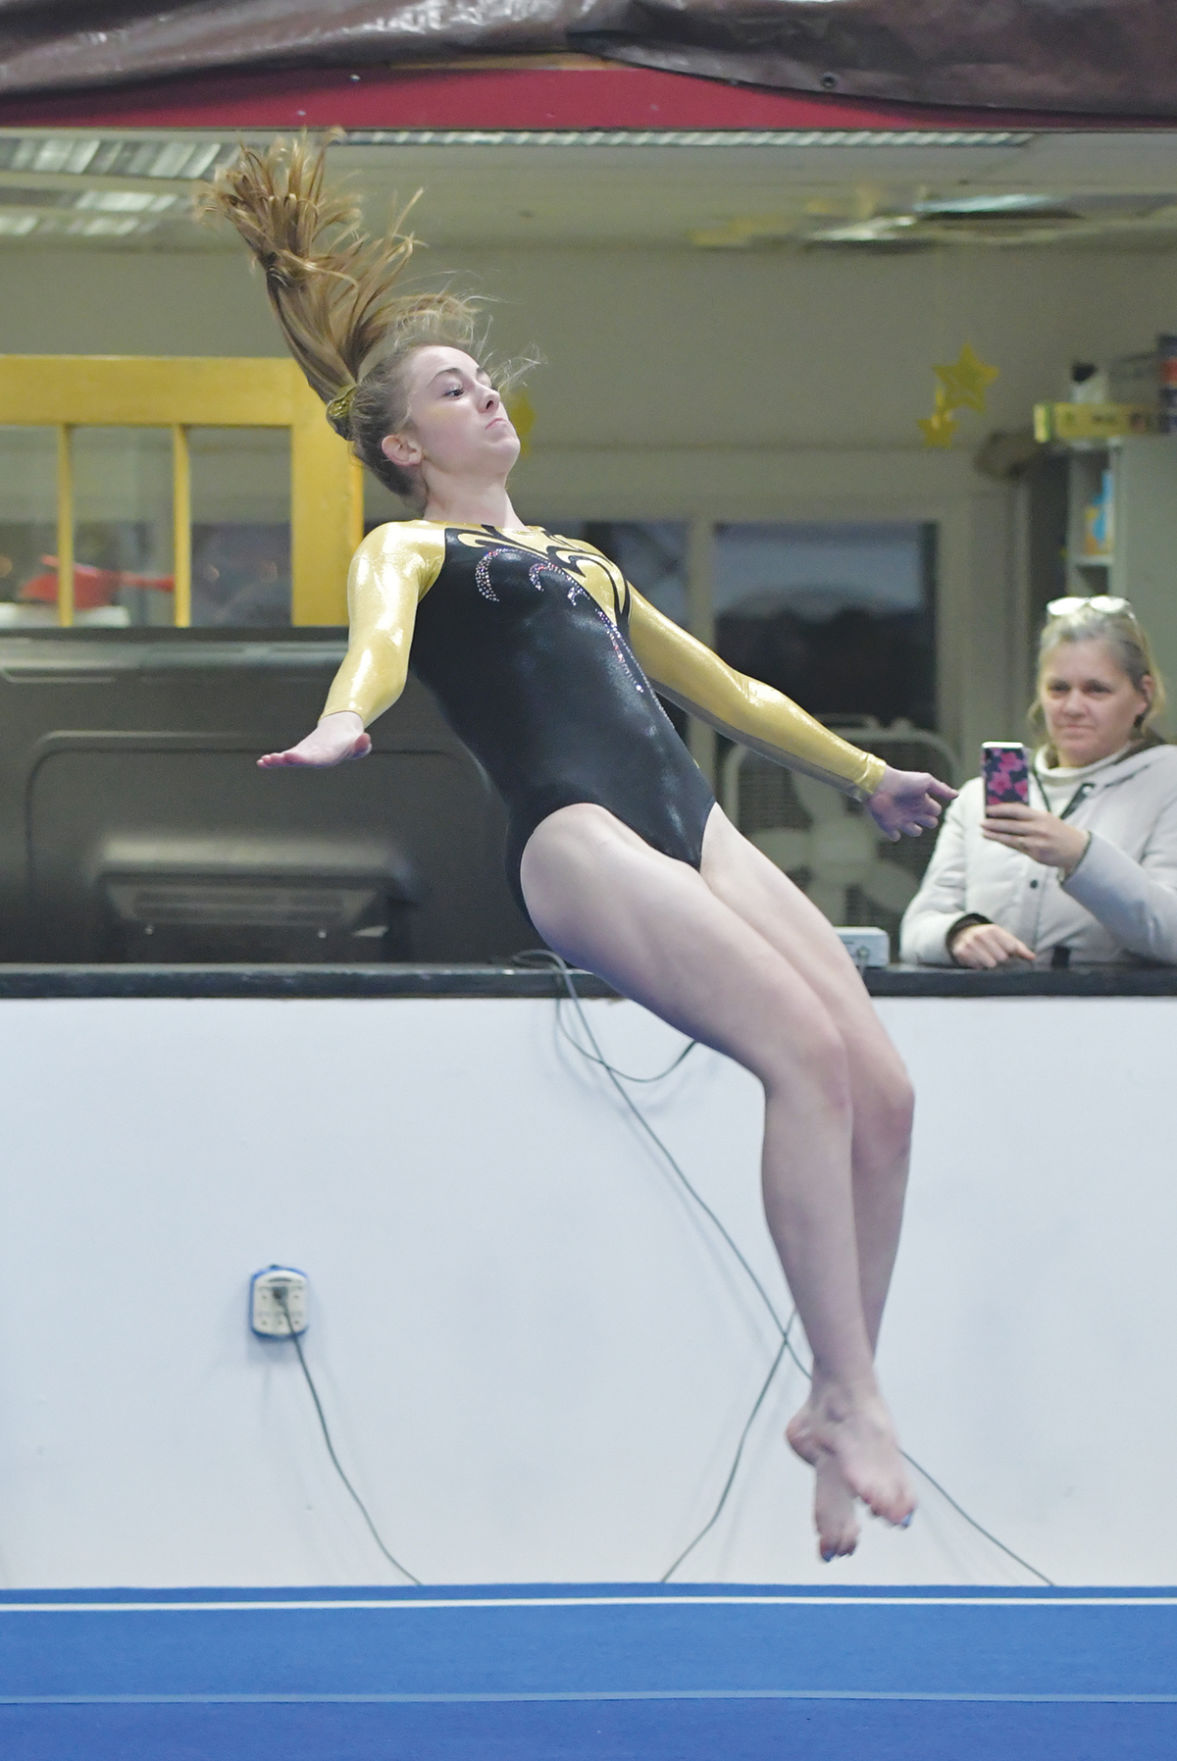 Harwood gymnastics meet: Lynn Russell